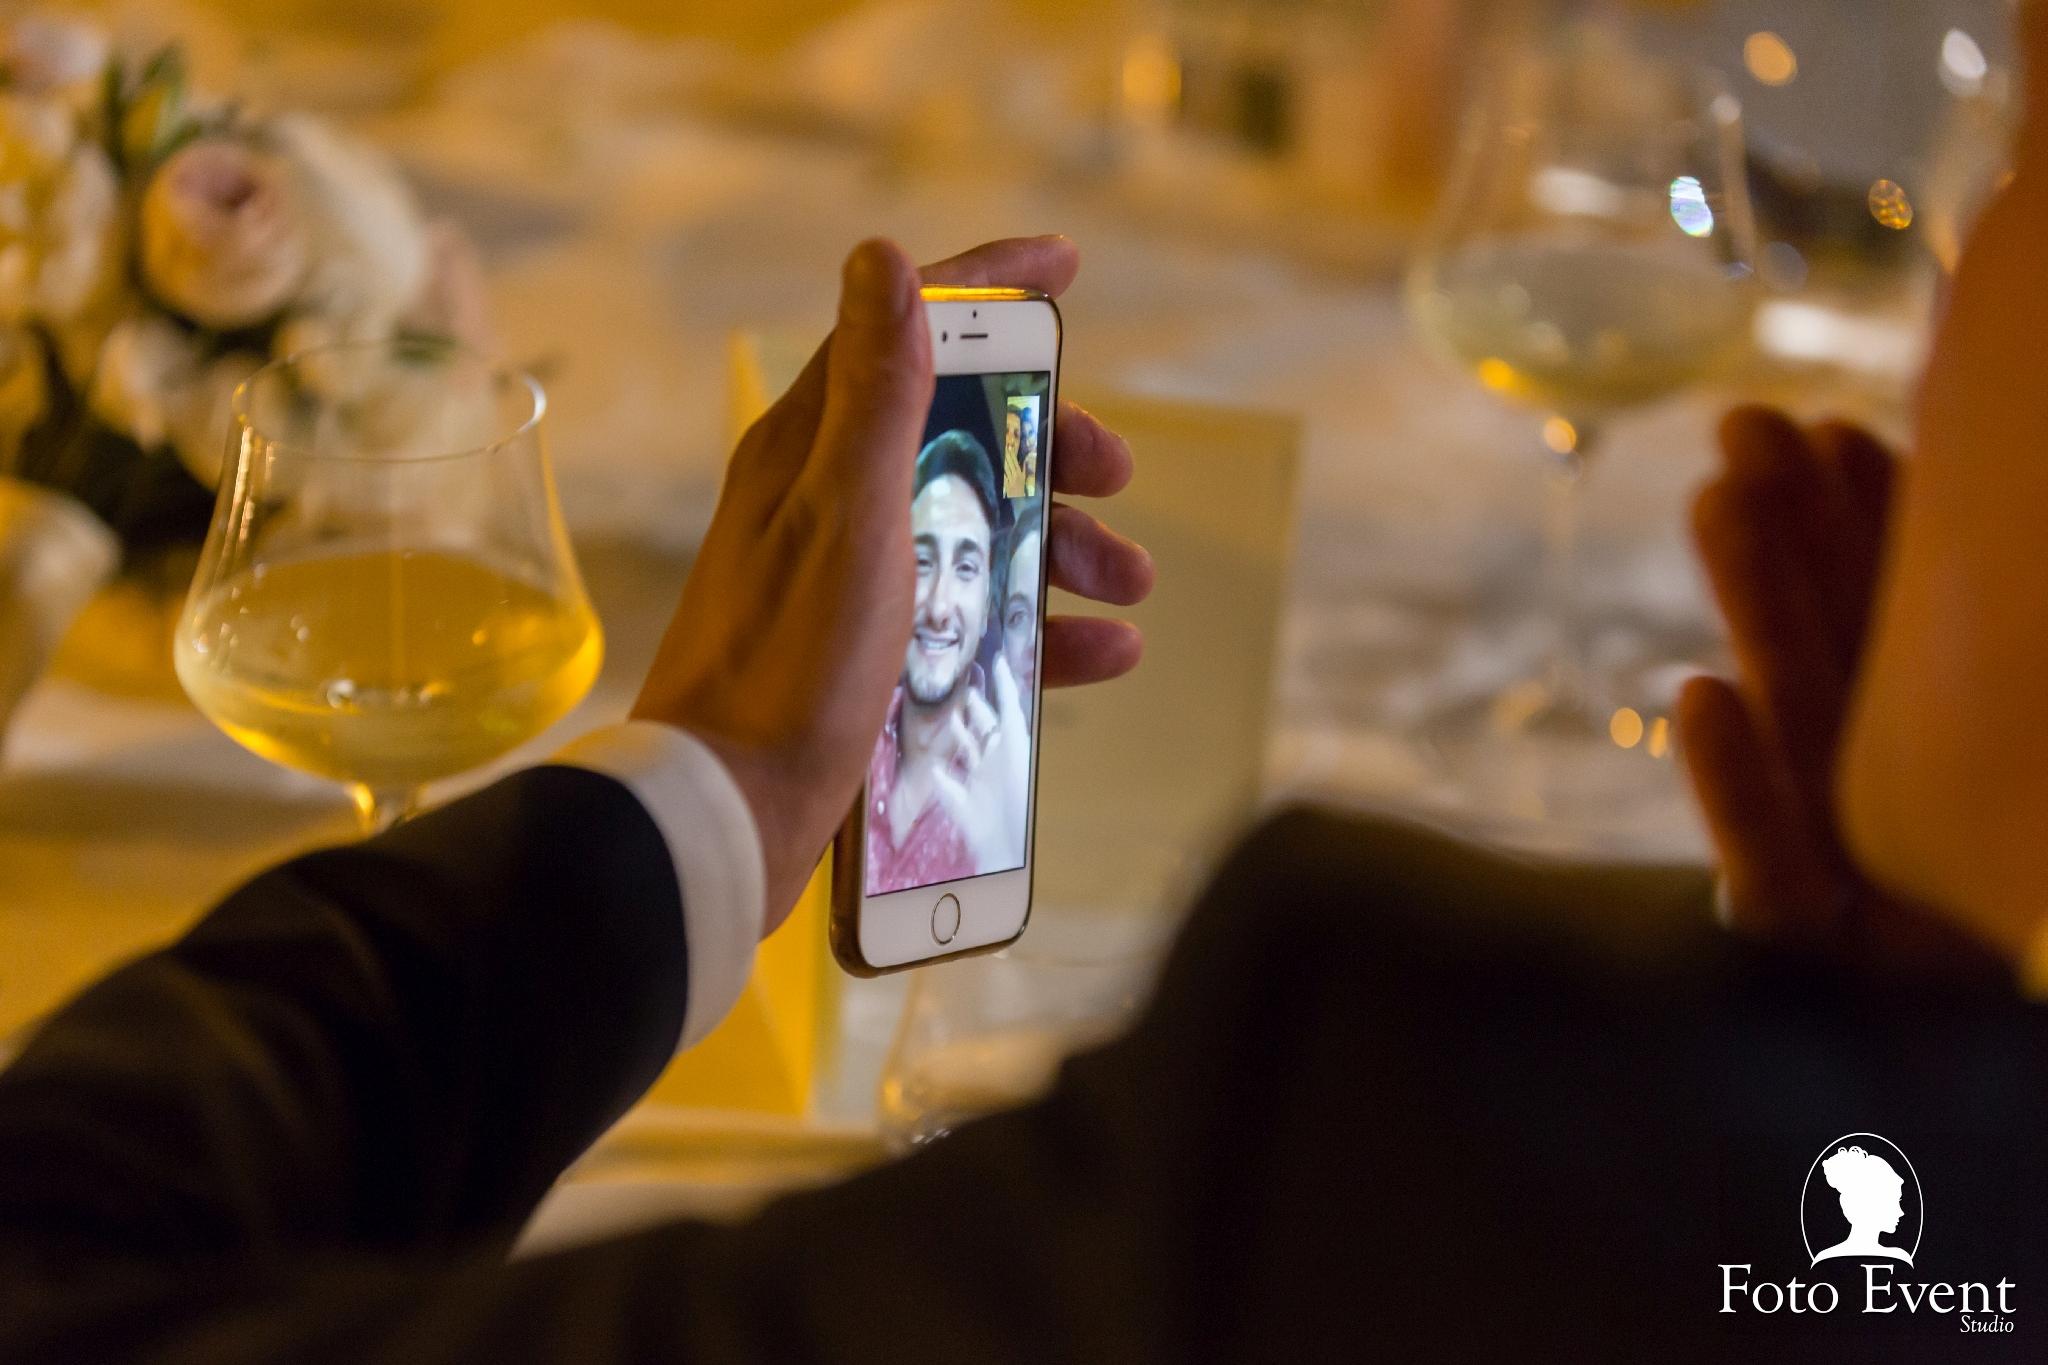 2017-07-21 Matrimonio Adriana e Giuseppe Dorsi zoom 388 CD FOTO